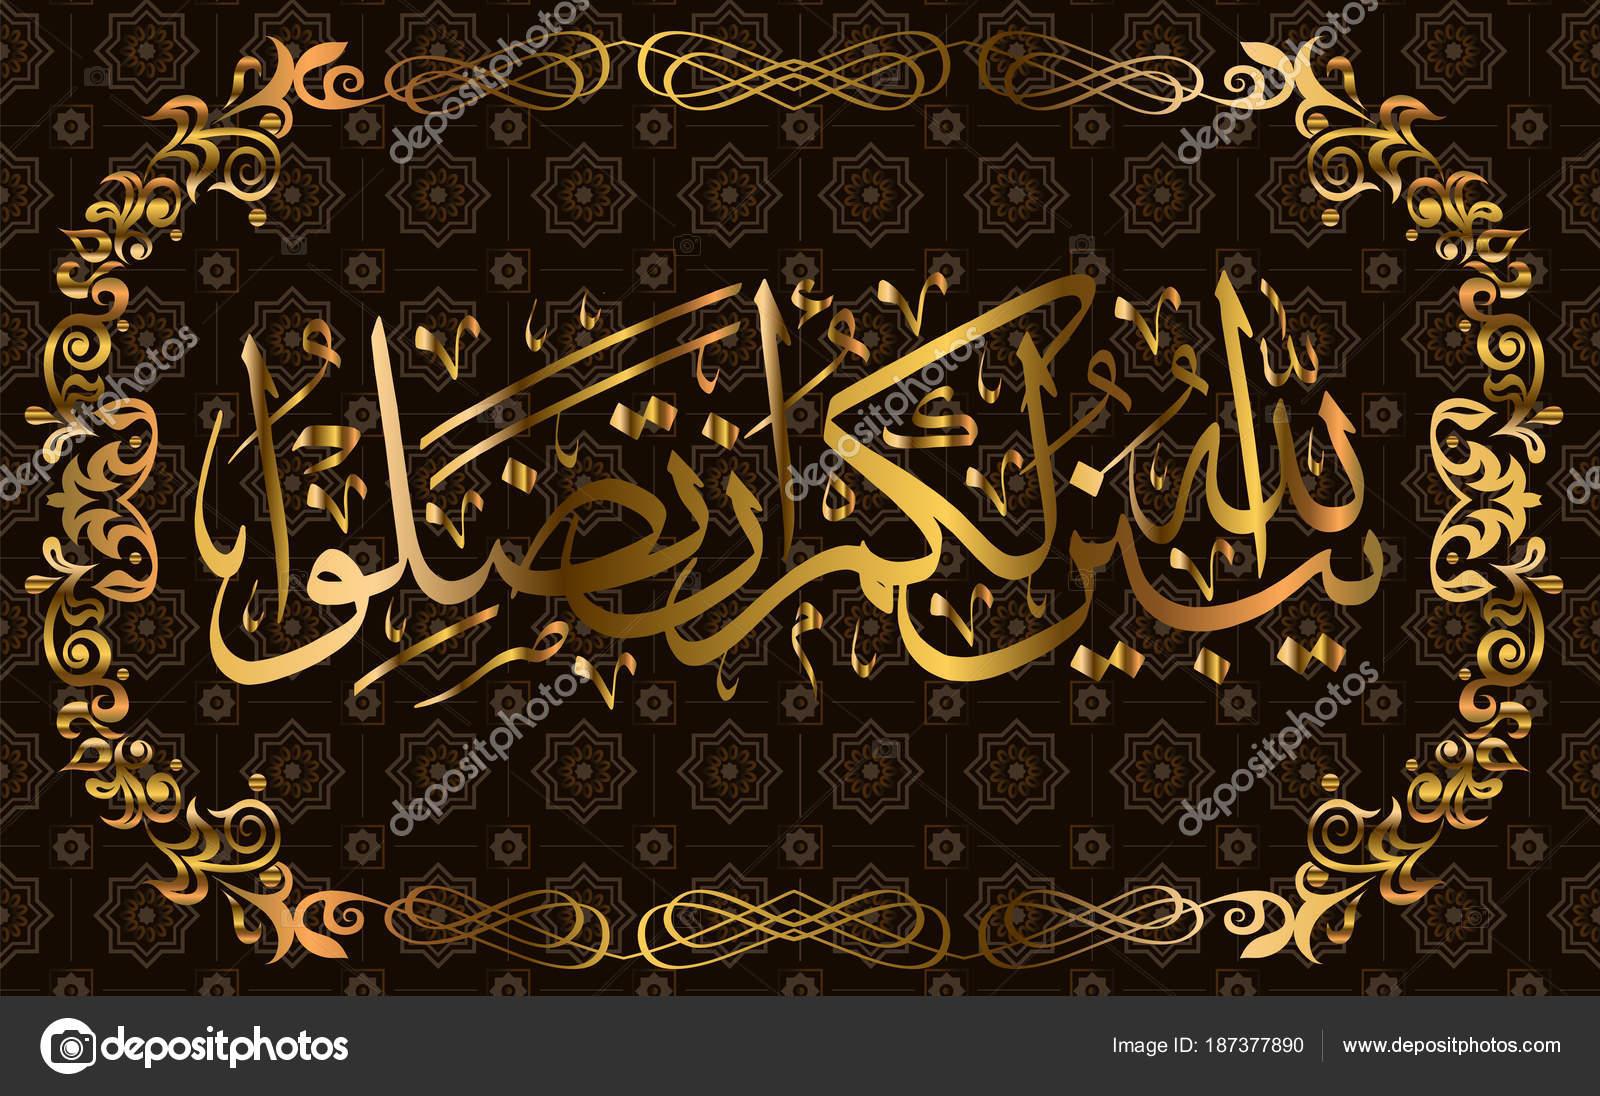 Calligraphy quranic ayat | Arabic calligraphy Quran Surah 4